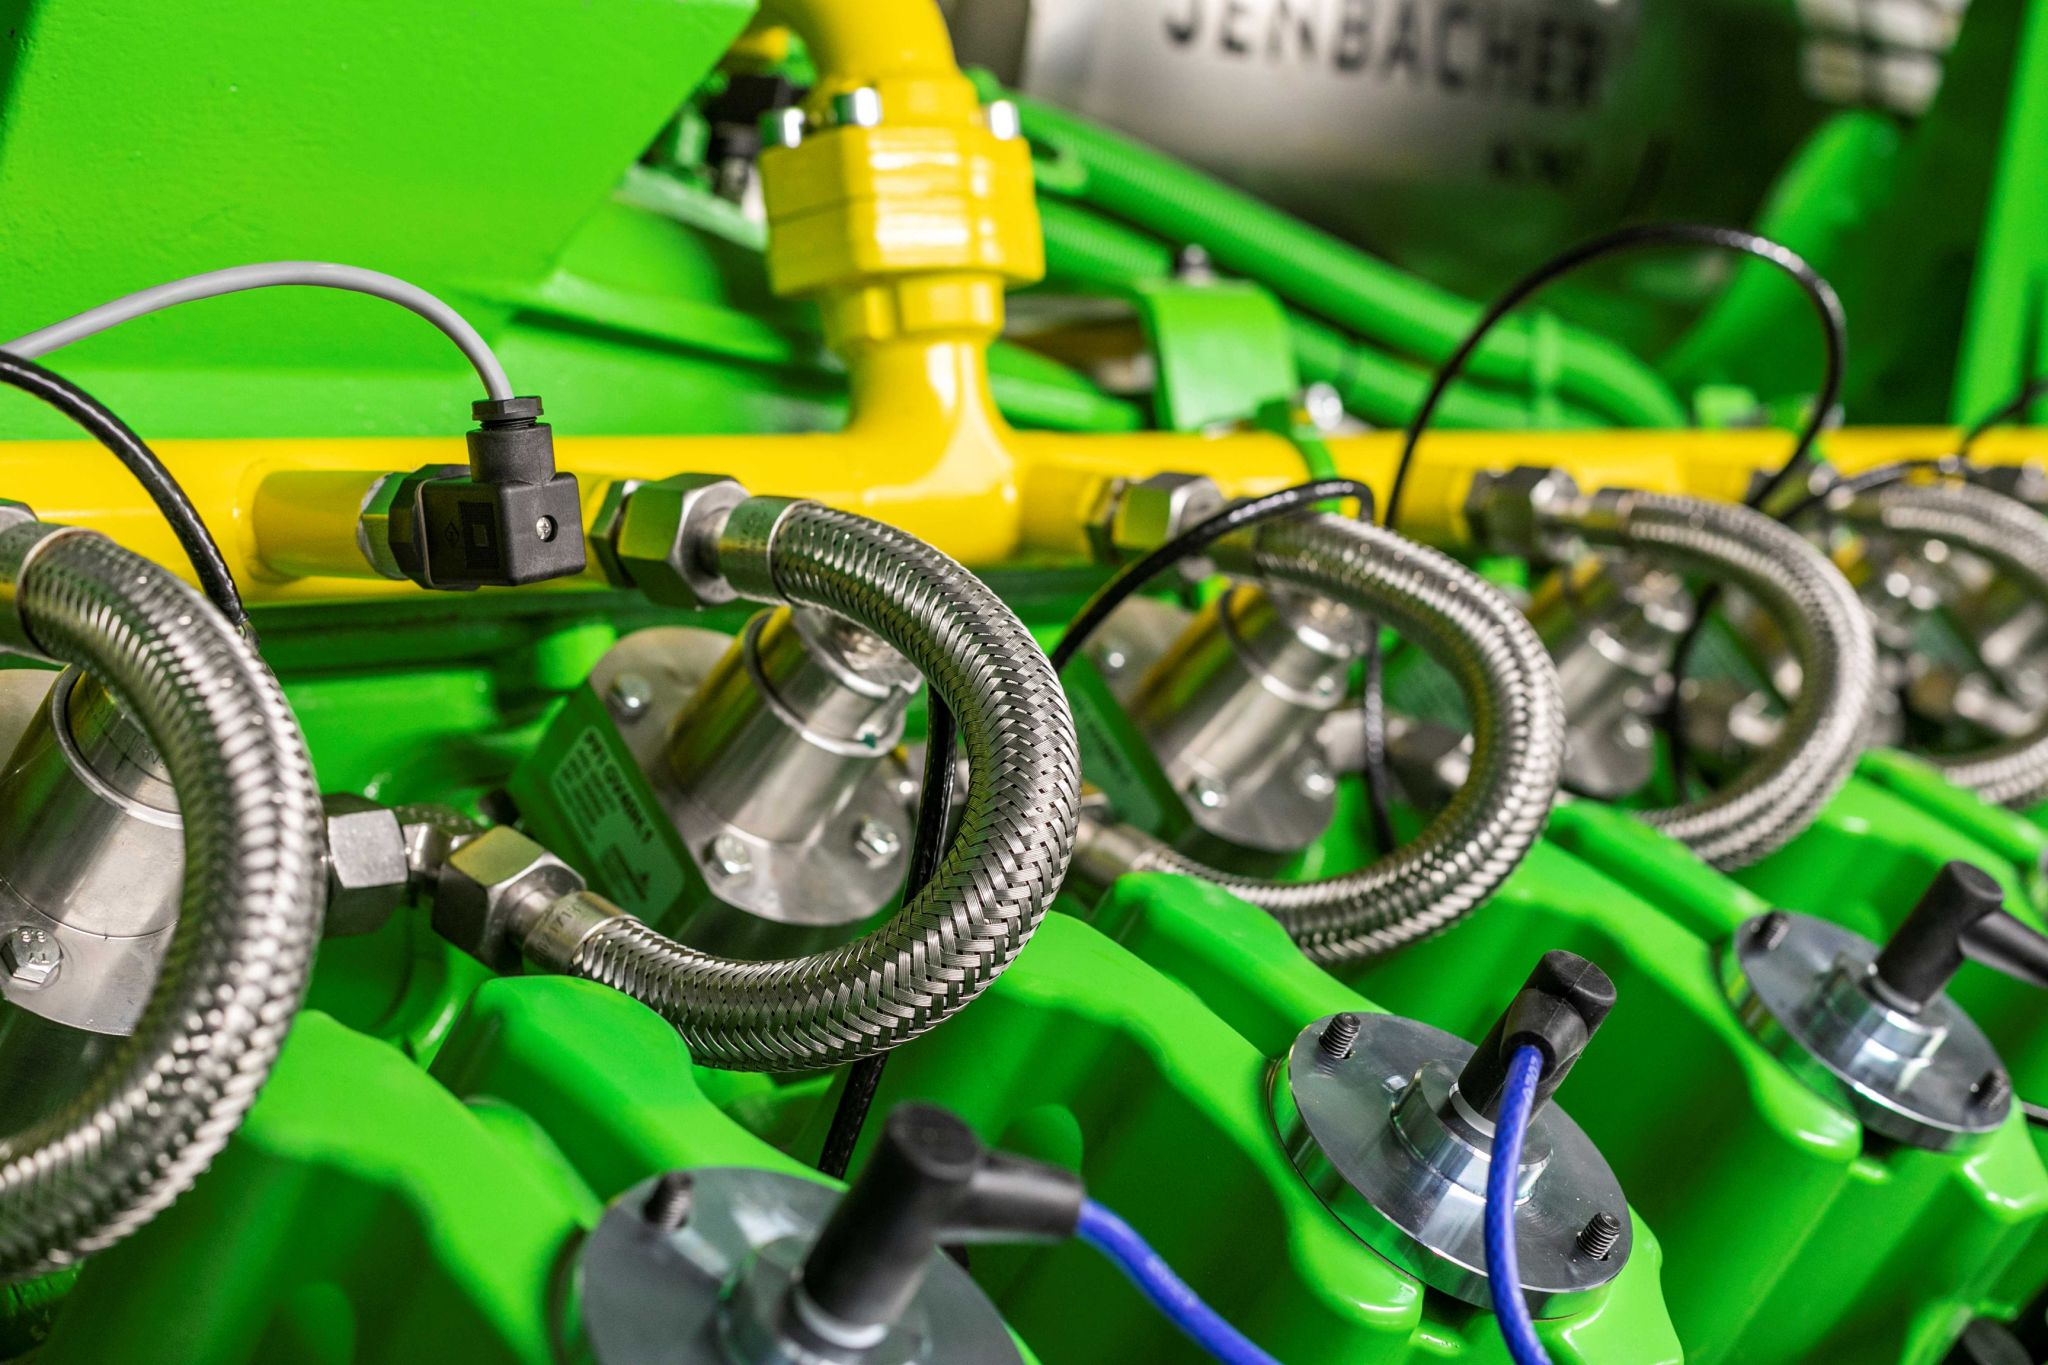 Первая мини-ТЭЦ Jenbacher на водороде в работе